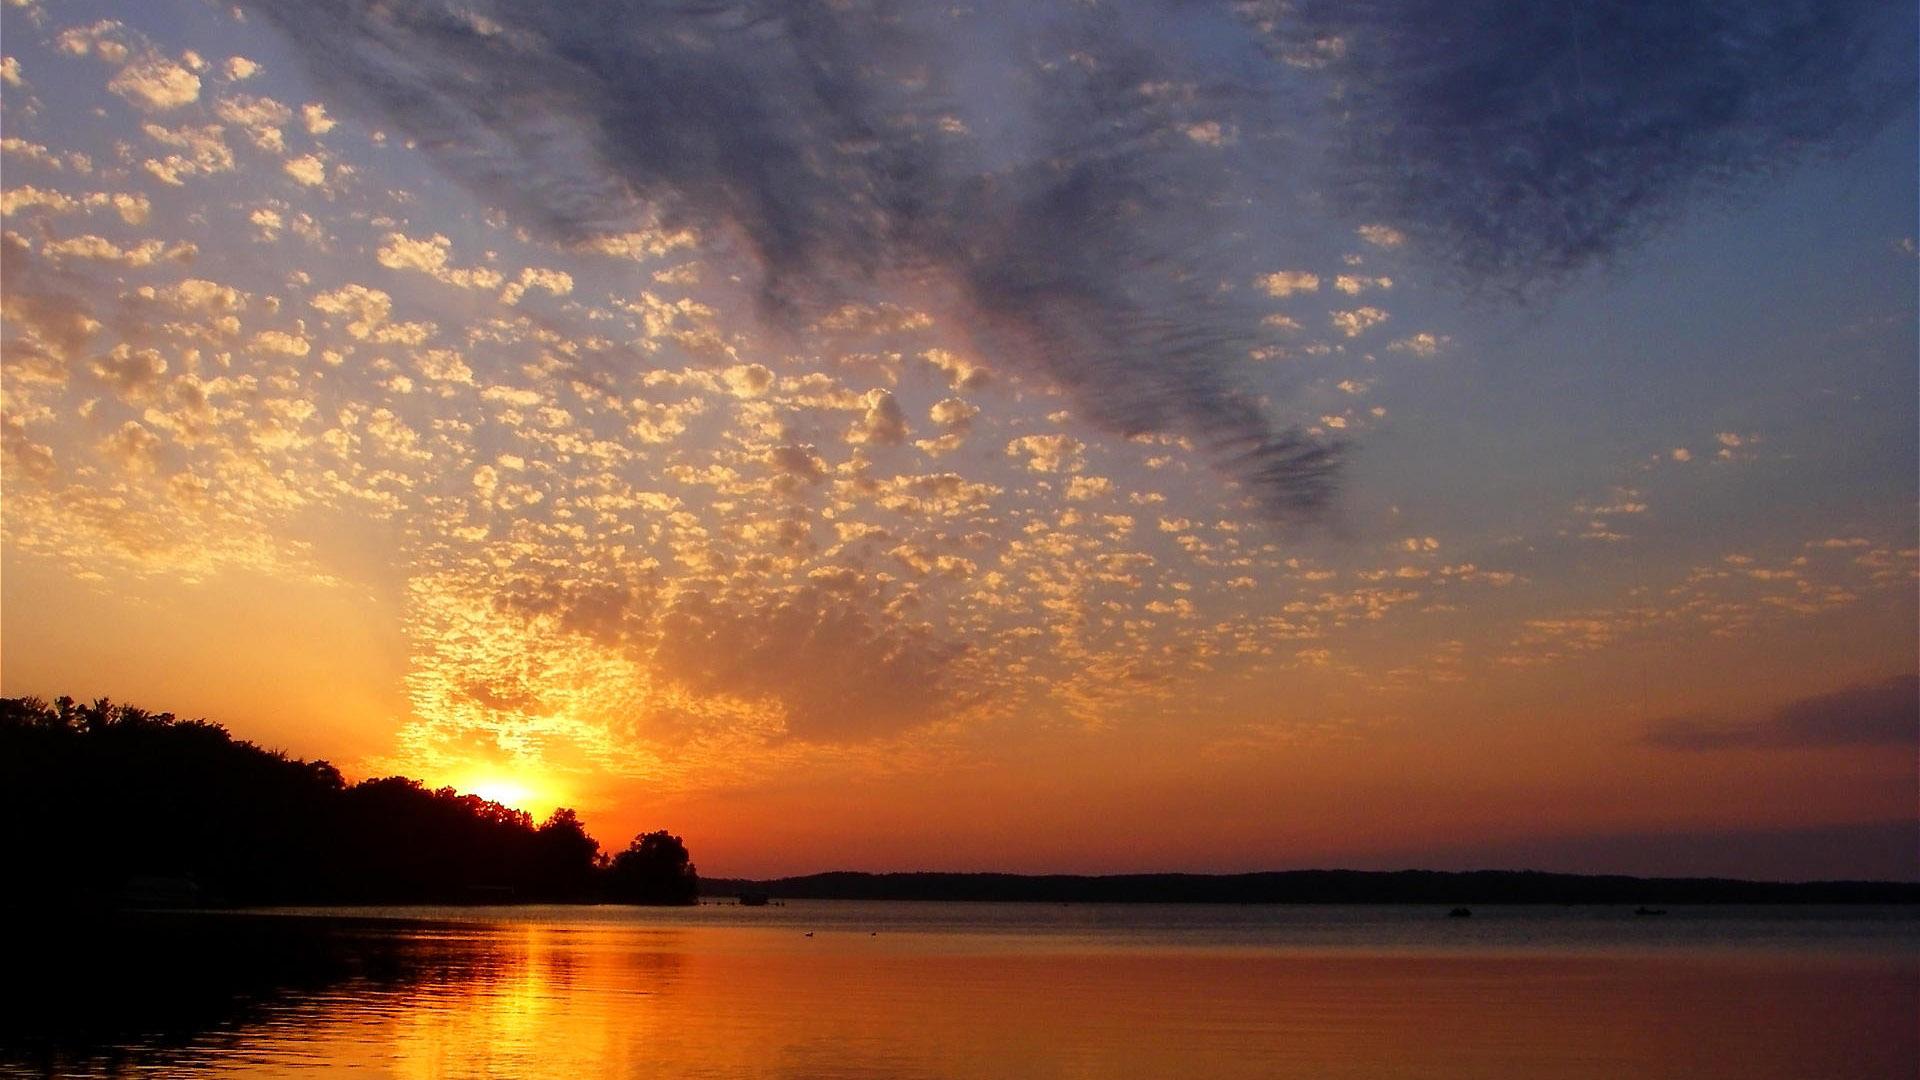 Landscape Sunset Background